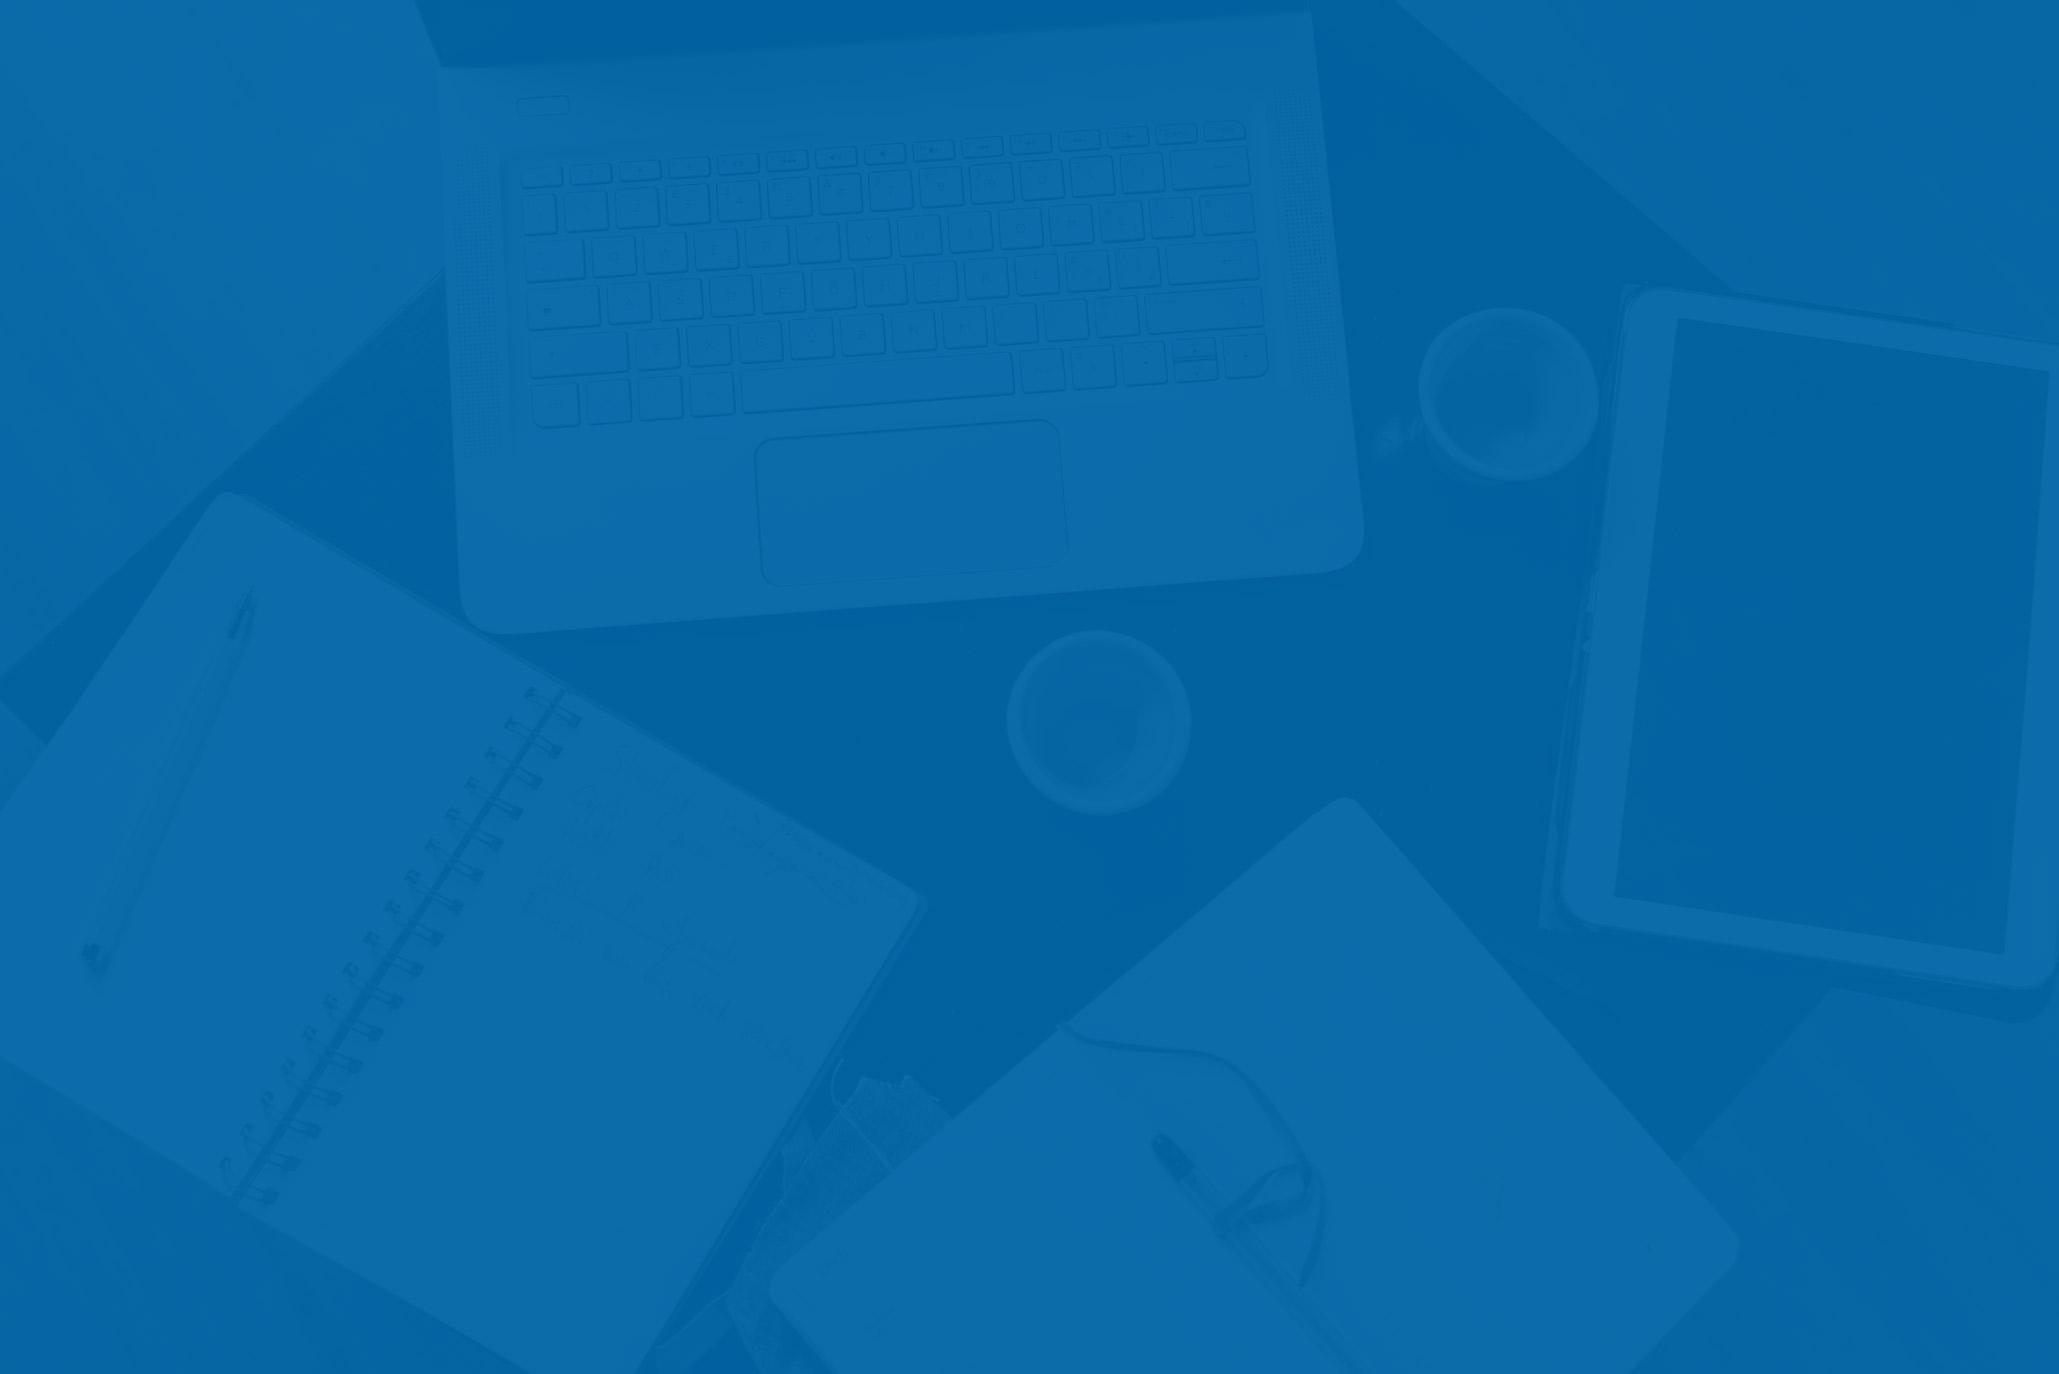 Buy essay online cheap transfer of technology